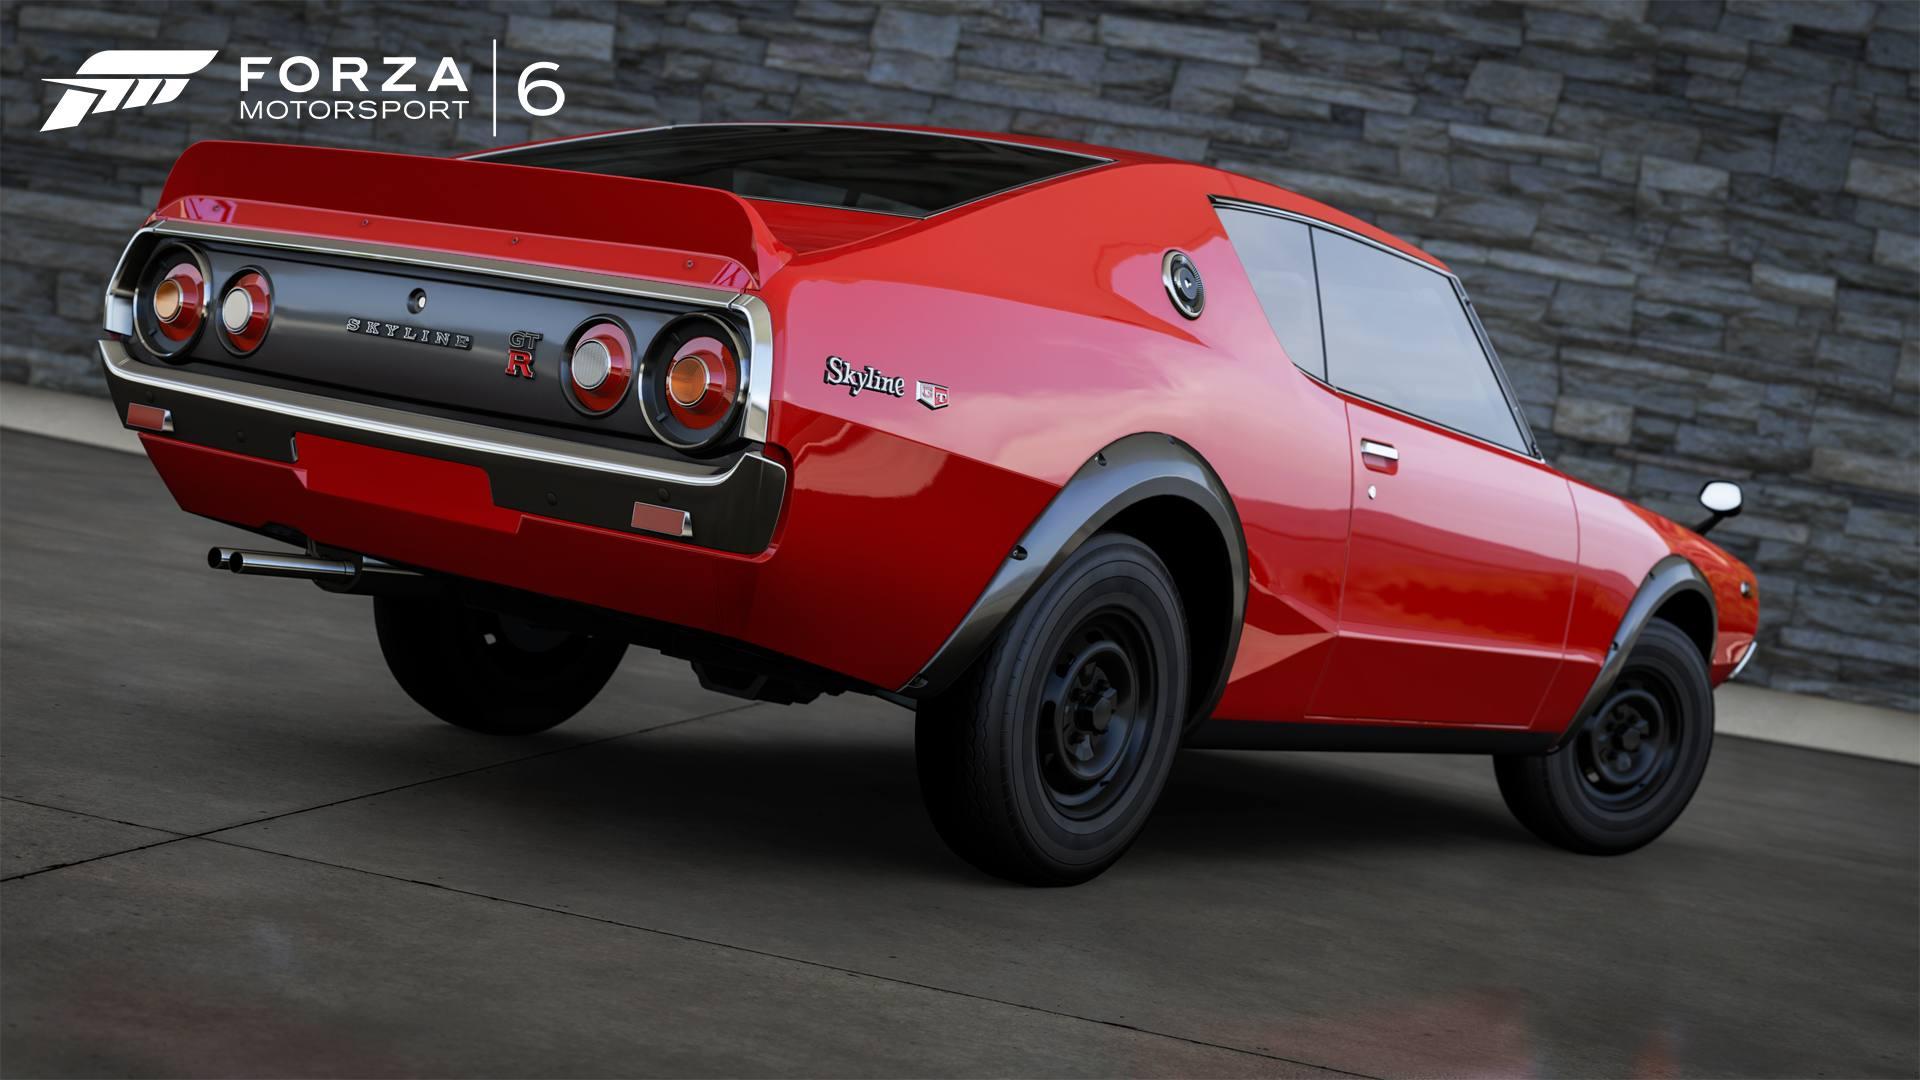 Forza Motorsport 6 05-01-16 2016 1973 Nissan Skyline GT-R